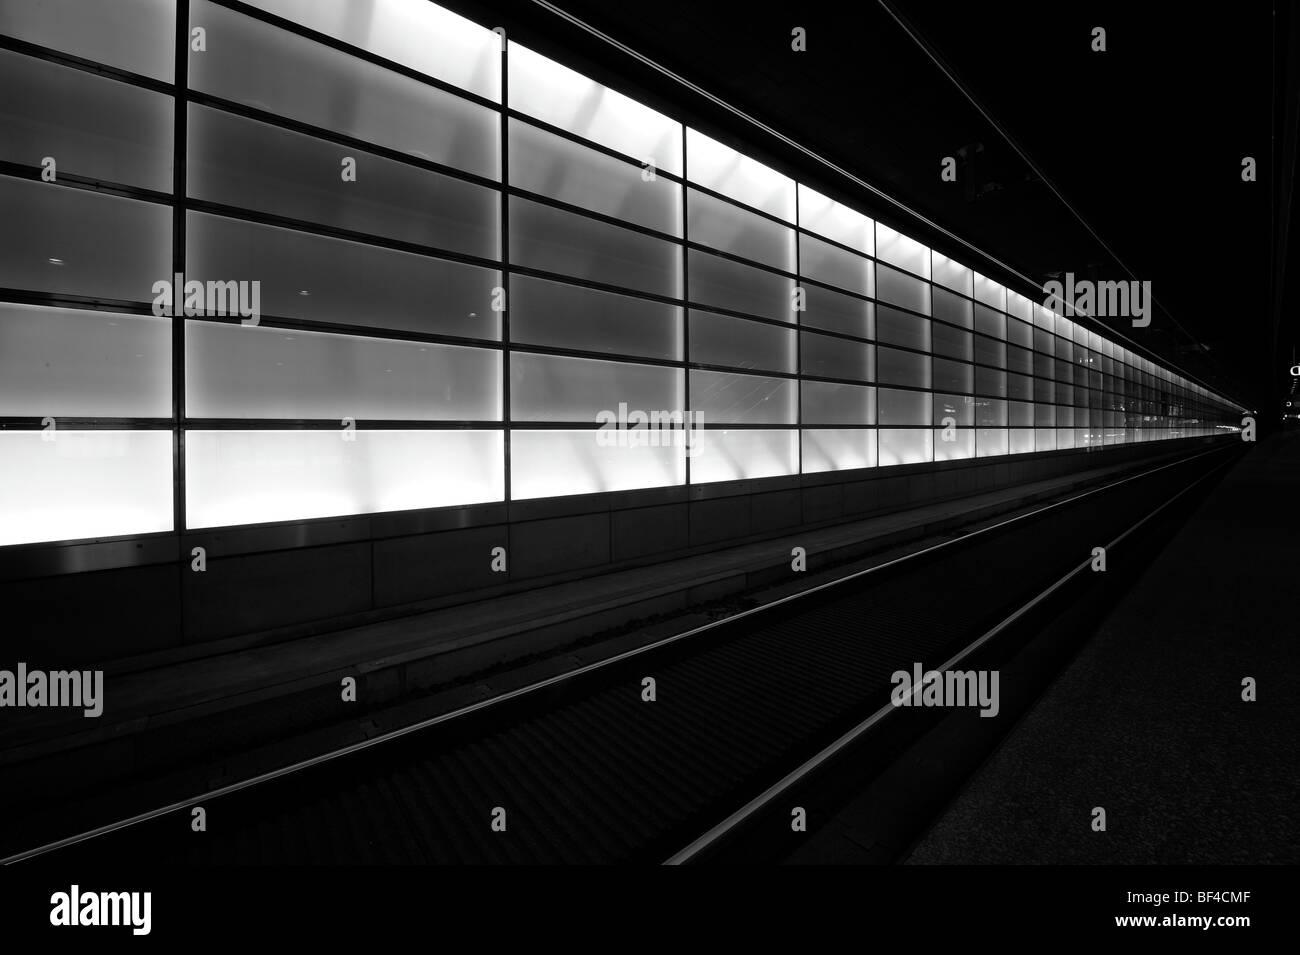 Train tracks at a railway station, Berlin Germany - Stock Image